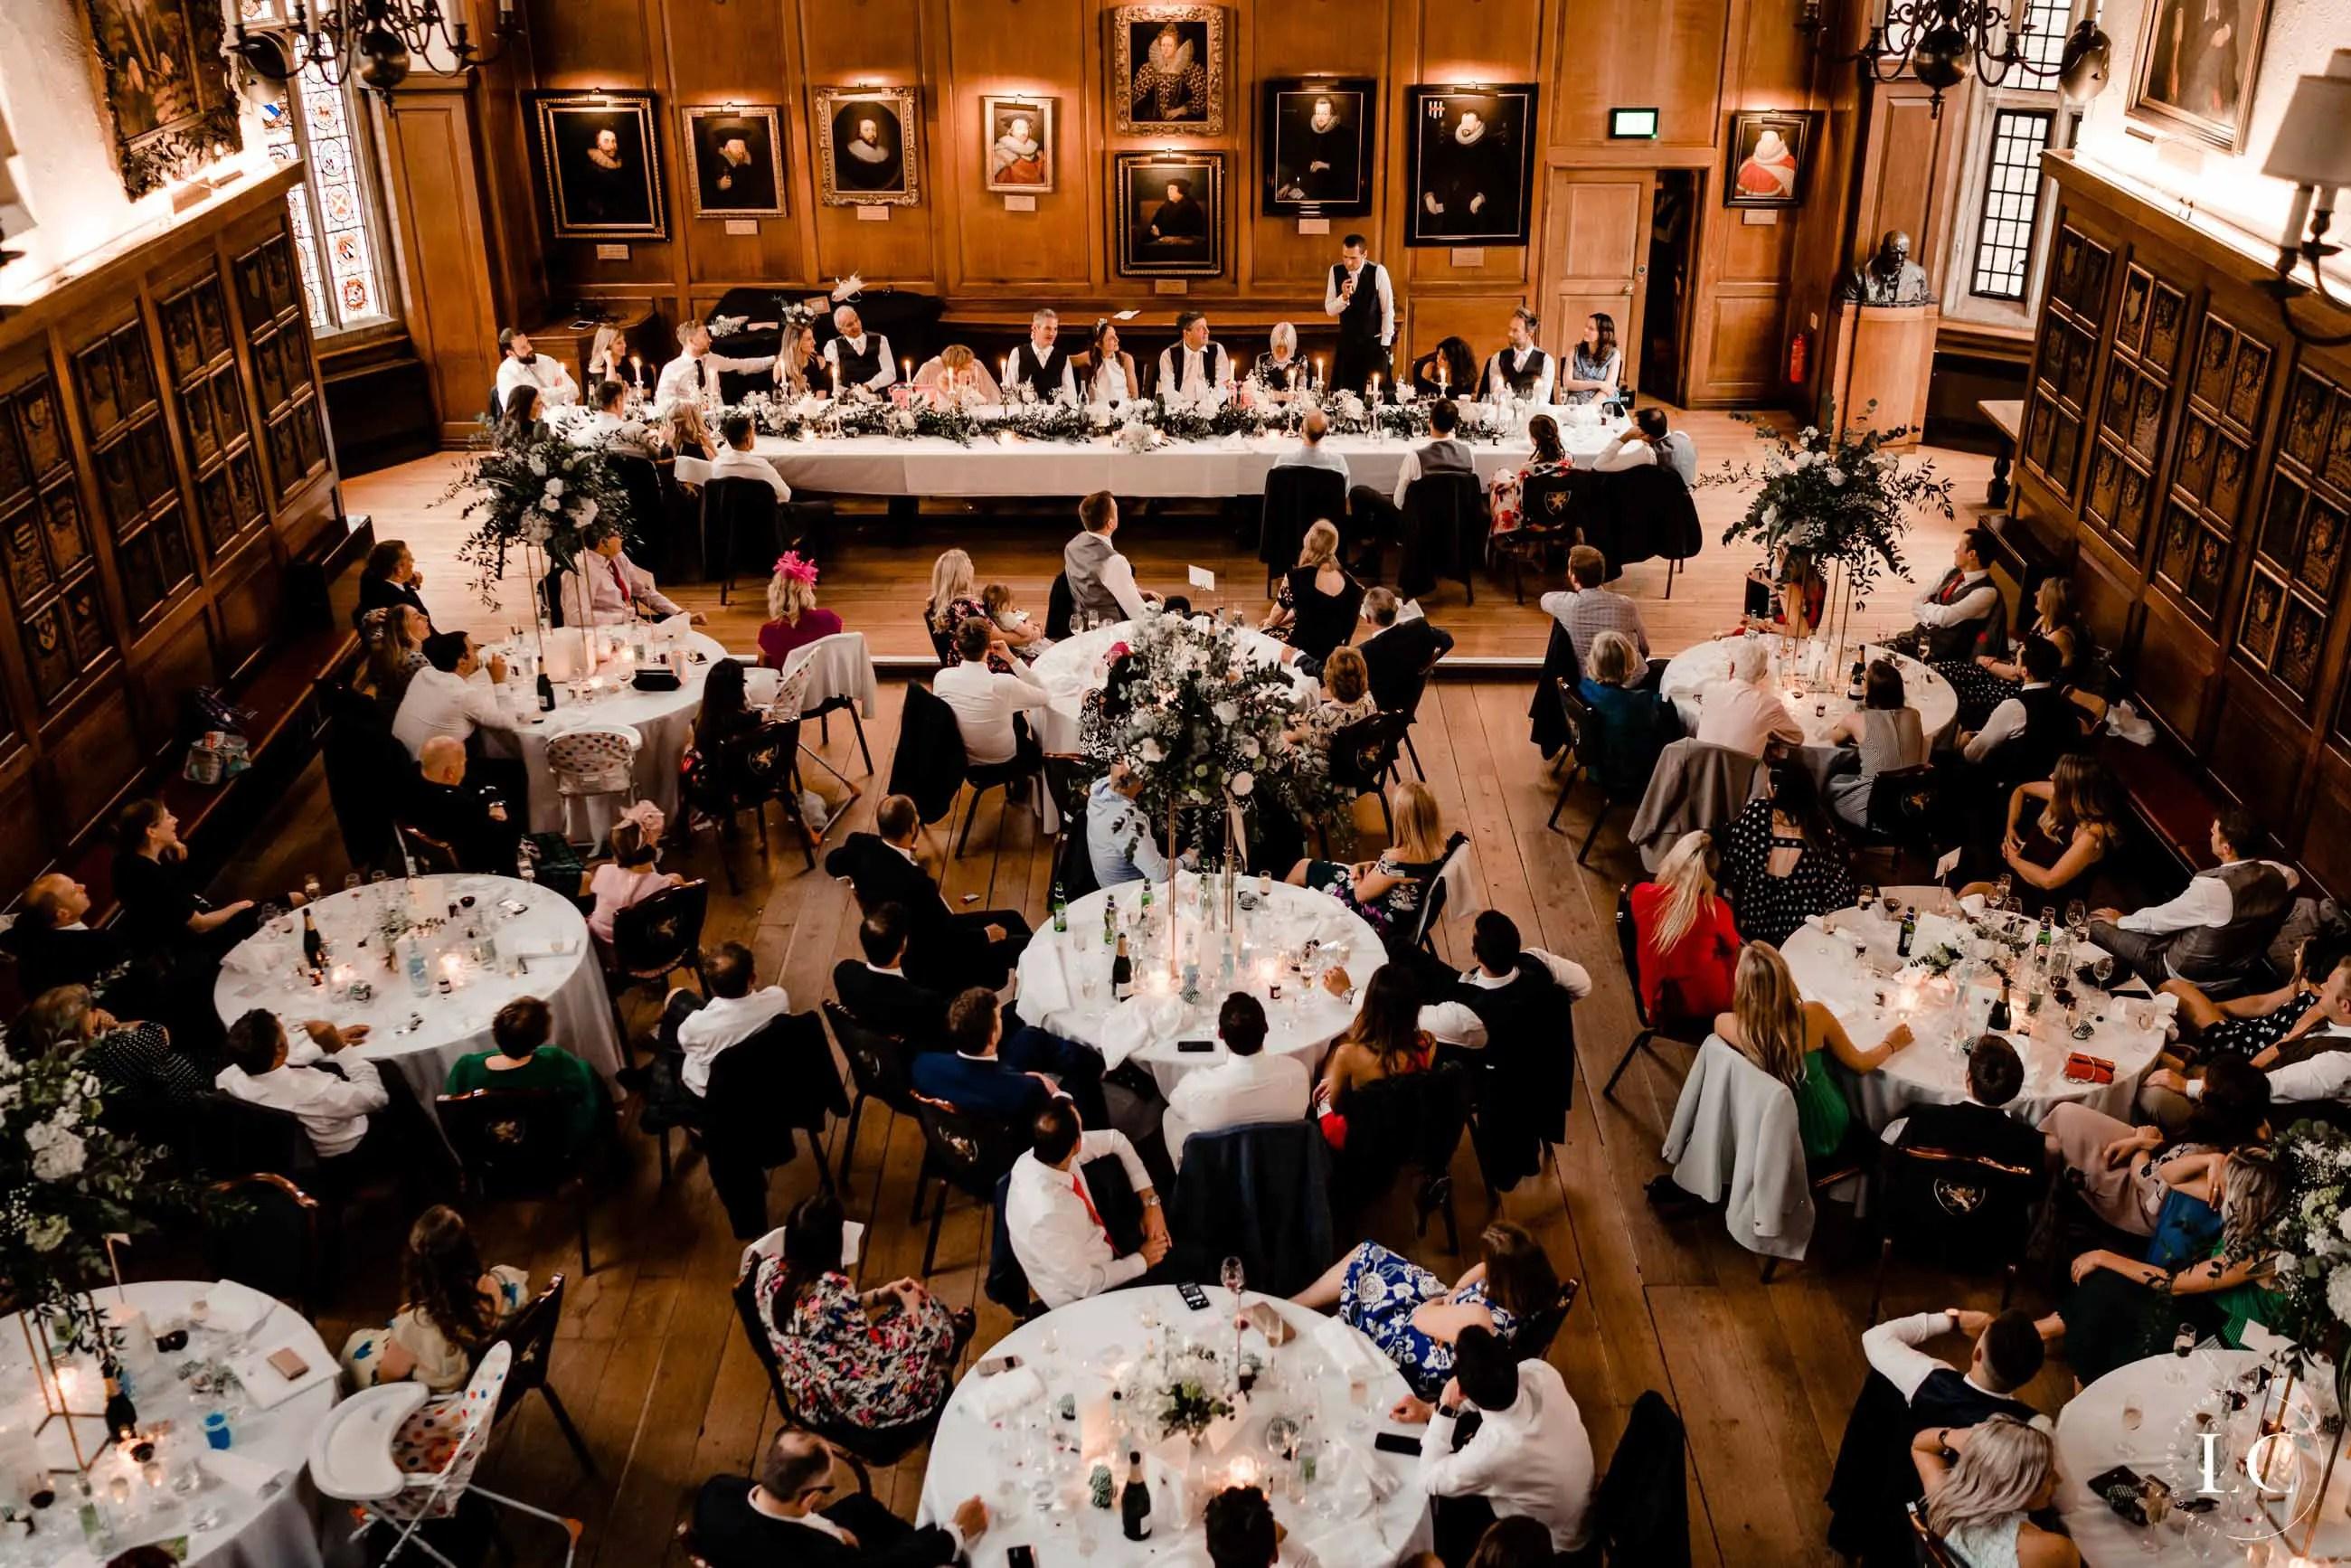 Wedding venue during dinner